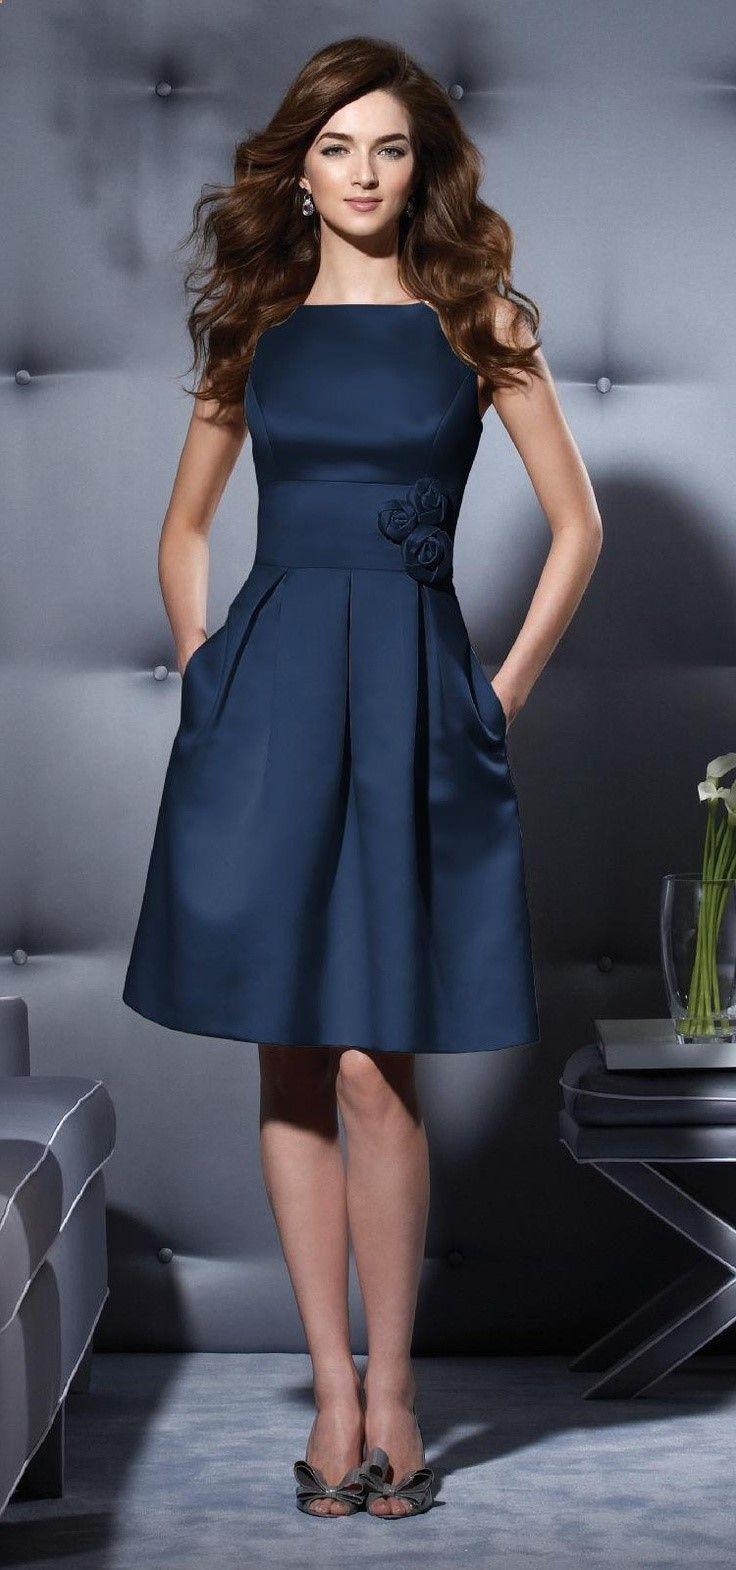 61 best Cocktail Dresses | Cocktail Dress images on Pinterest ...